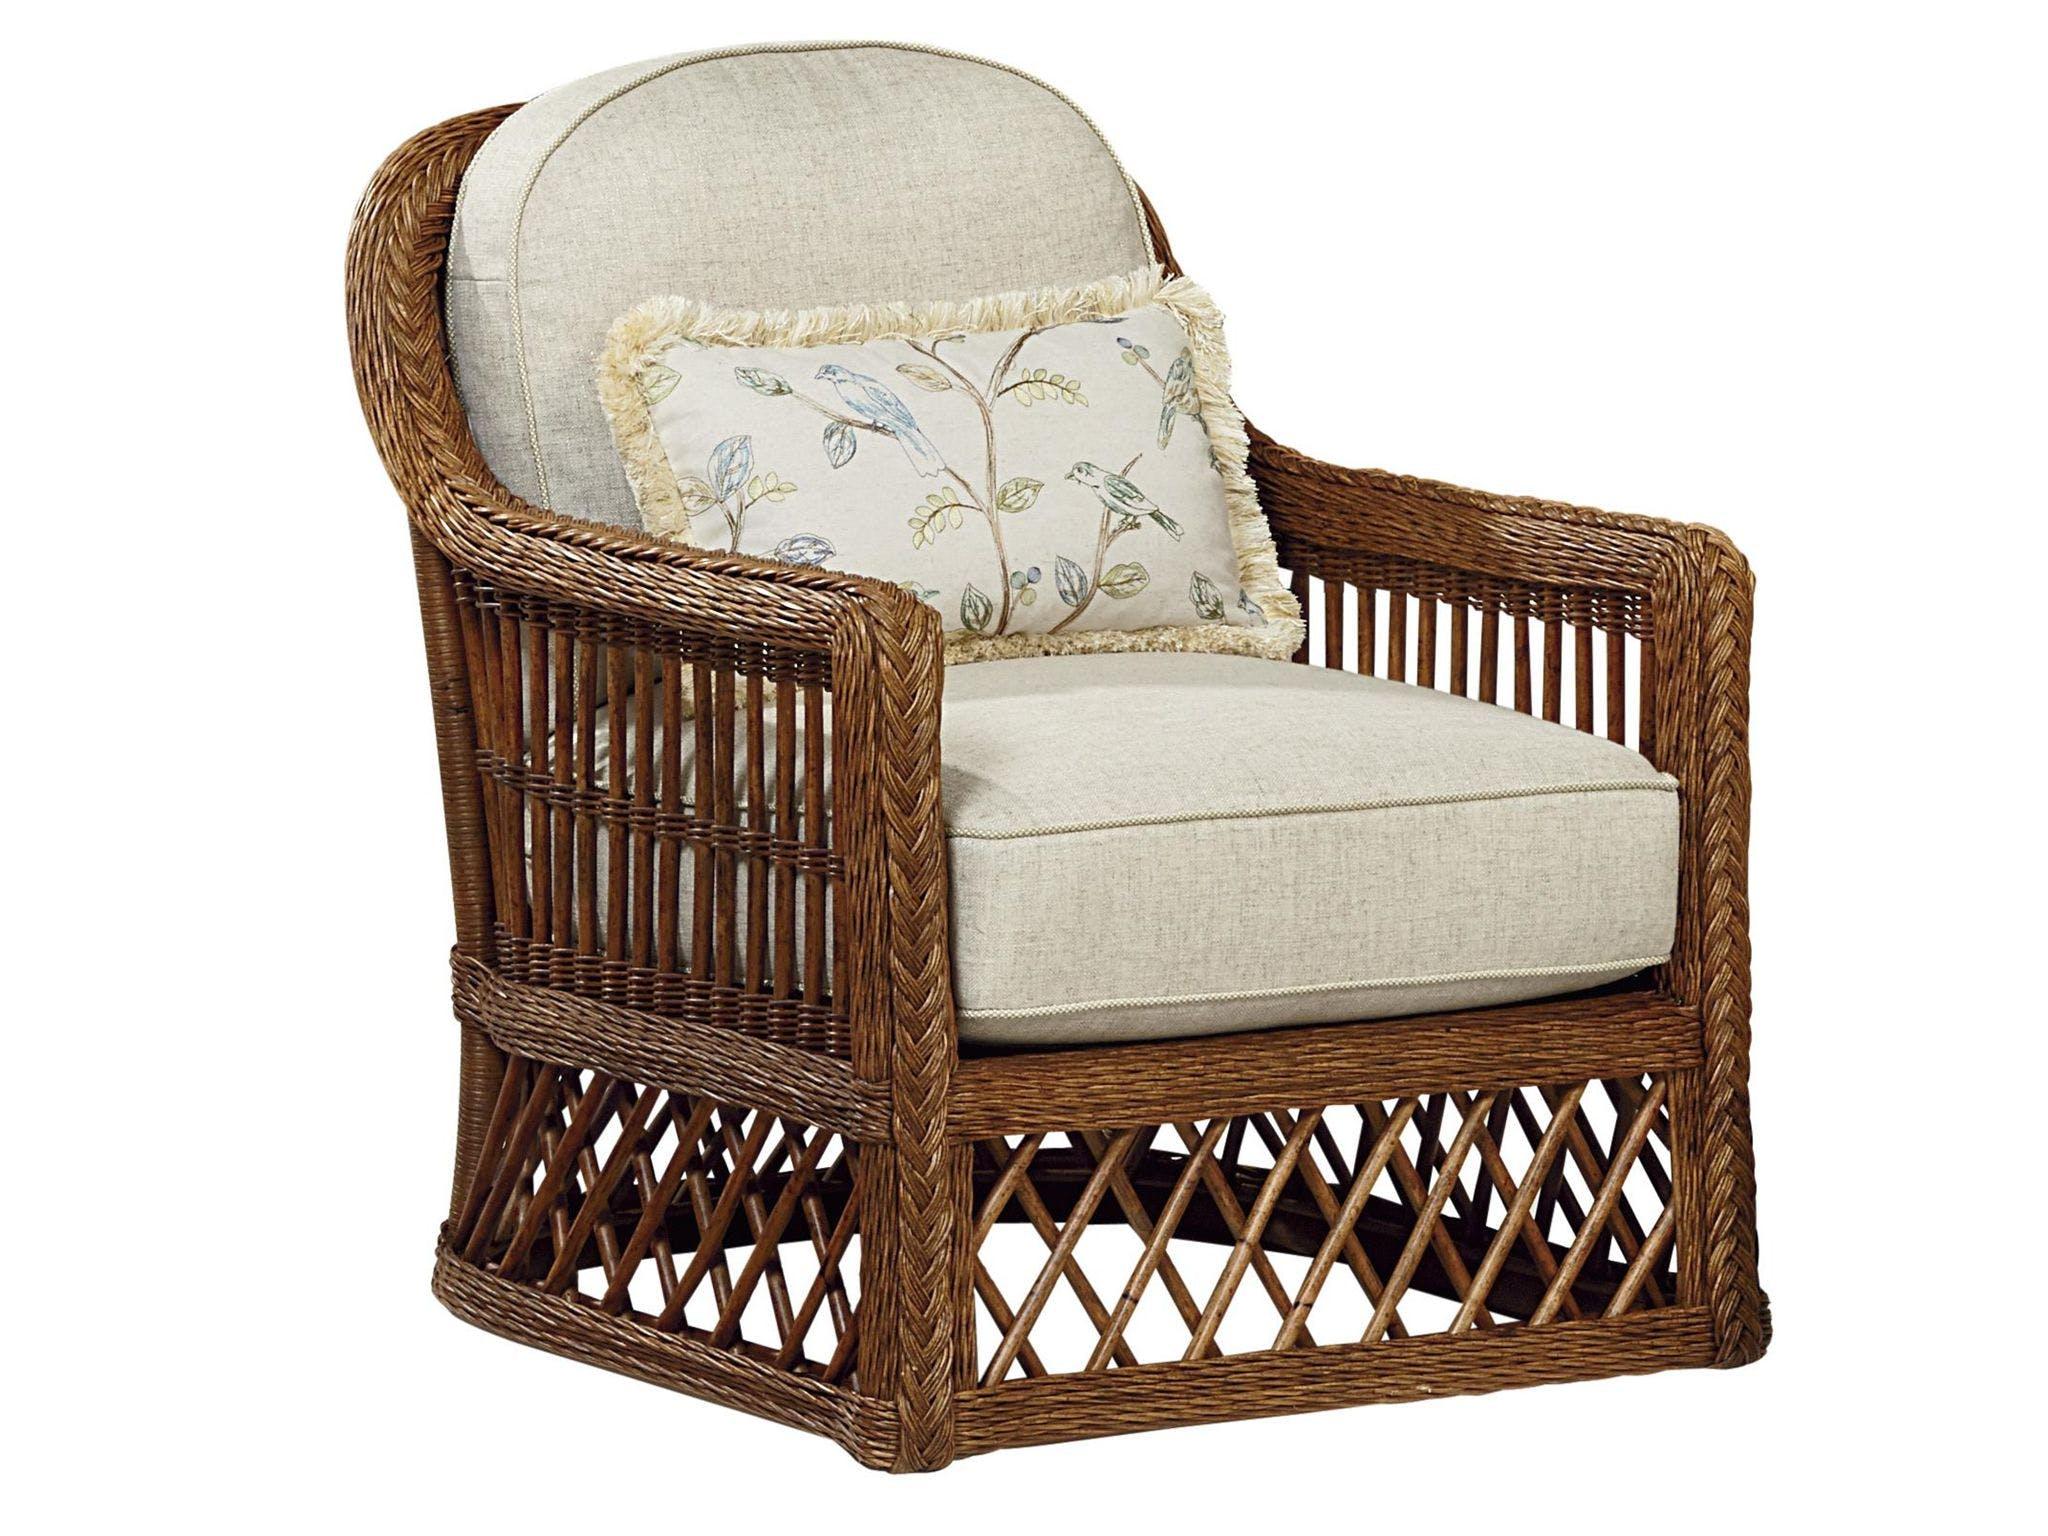 Fine Furniture Design Living Room Trellis Wicker Chair 4512